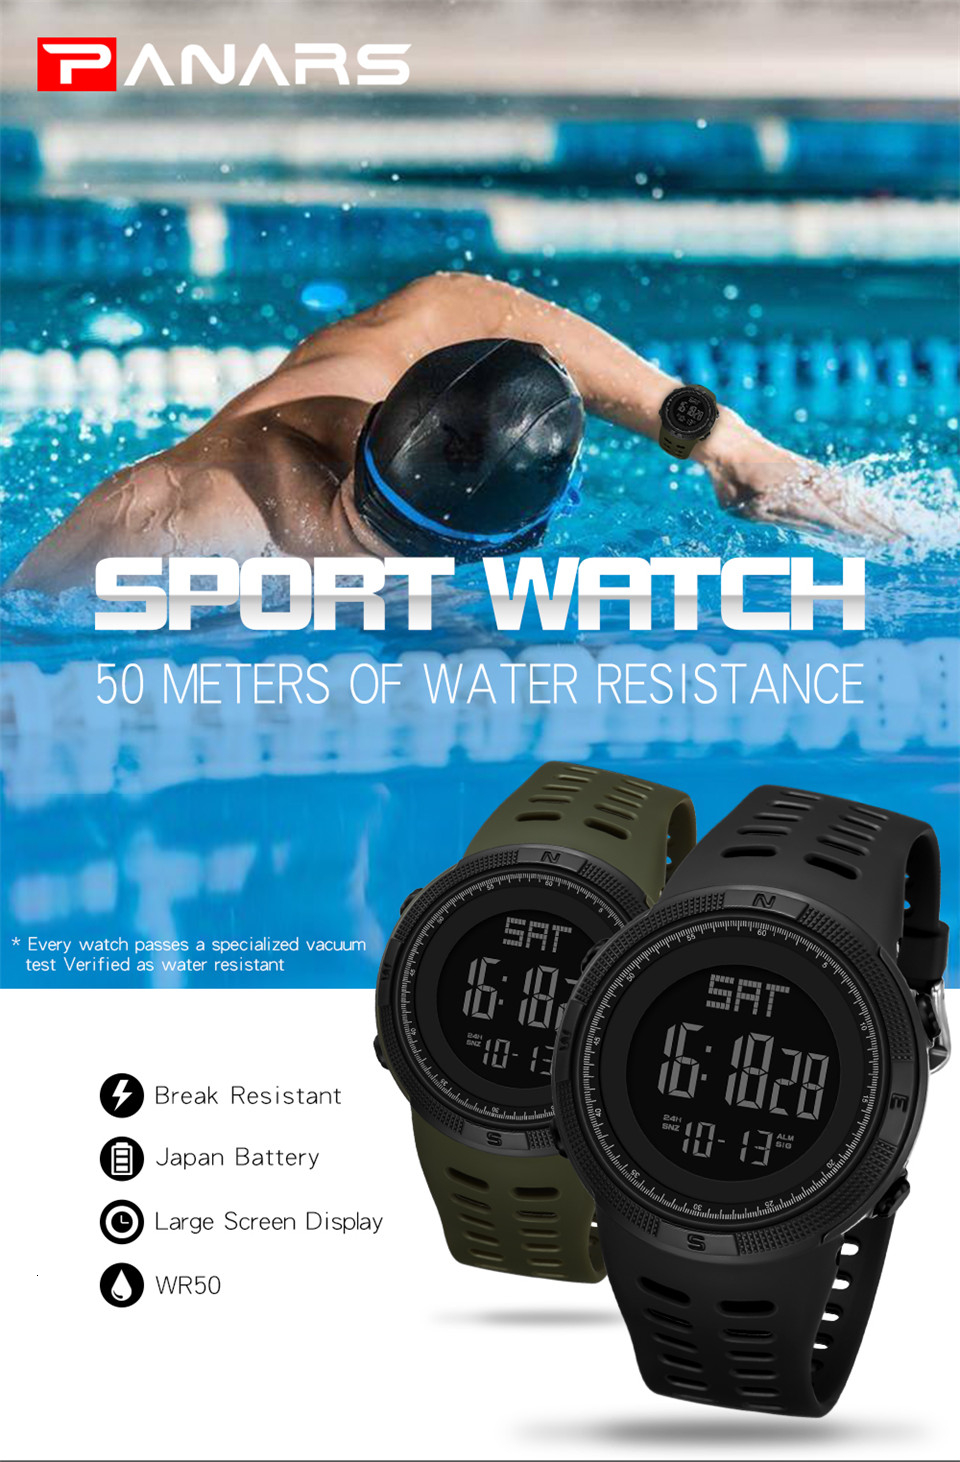 Sports Watch Men Digital Electronic Wrist Watch Waterproof LED Fitness Outdoor Watch For Running Chronograph Wristwatch Relojes (1)